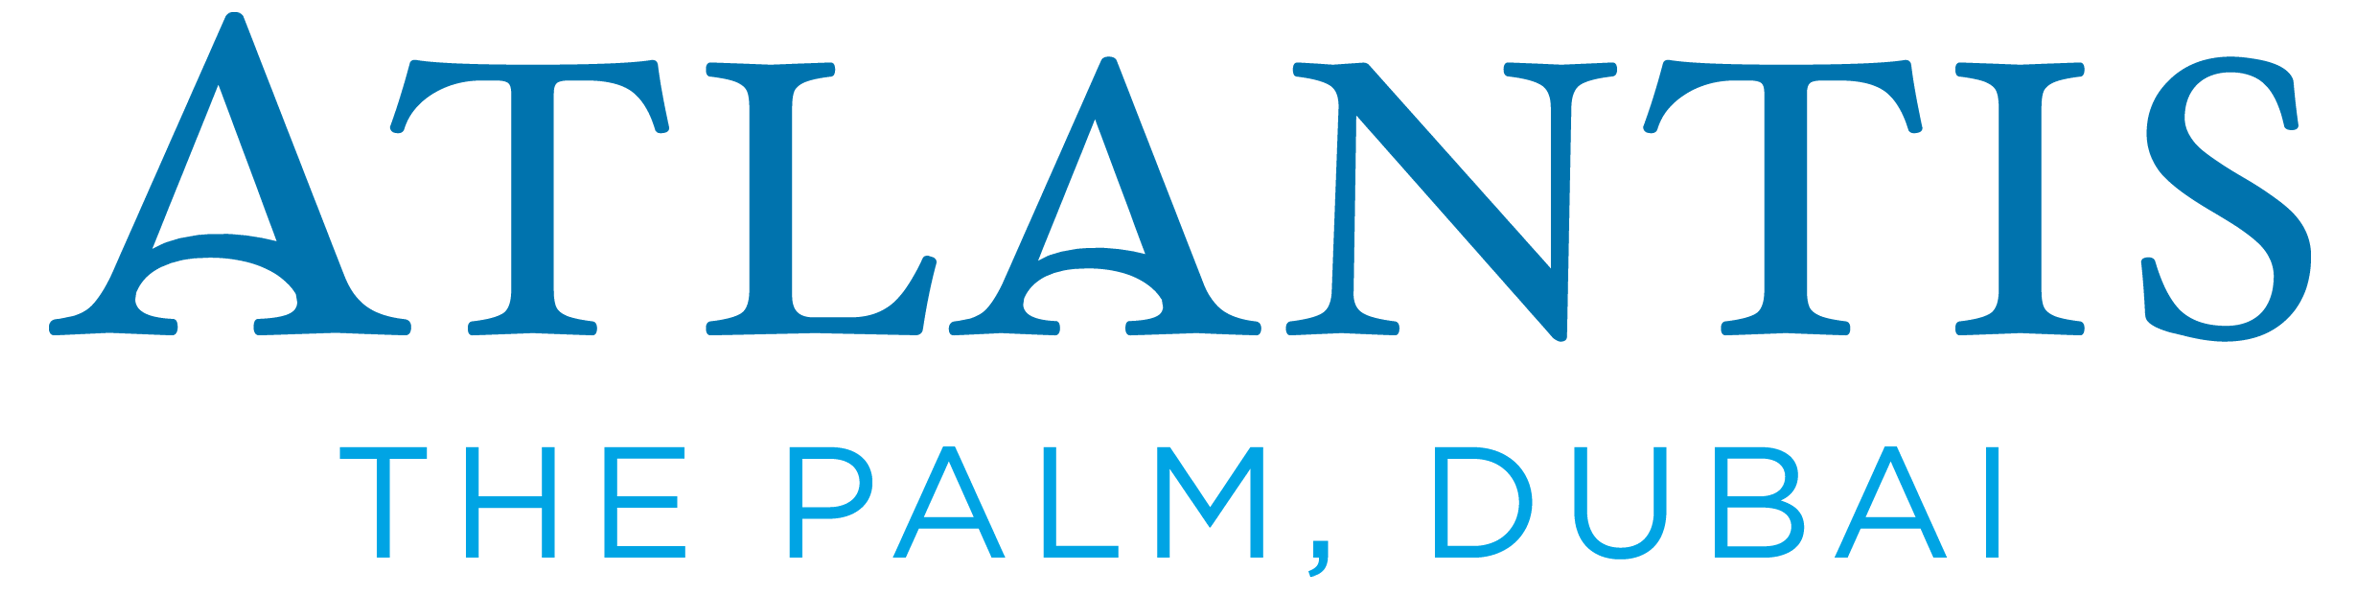 Celebrity news logos